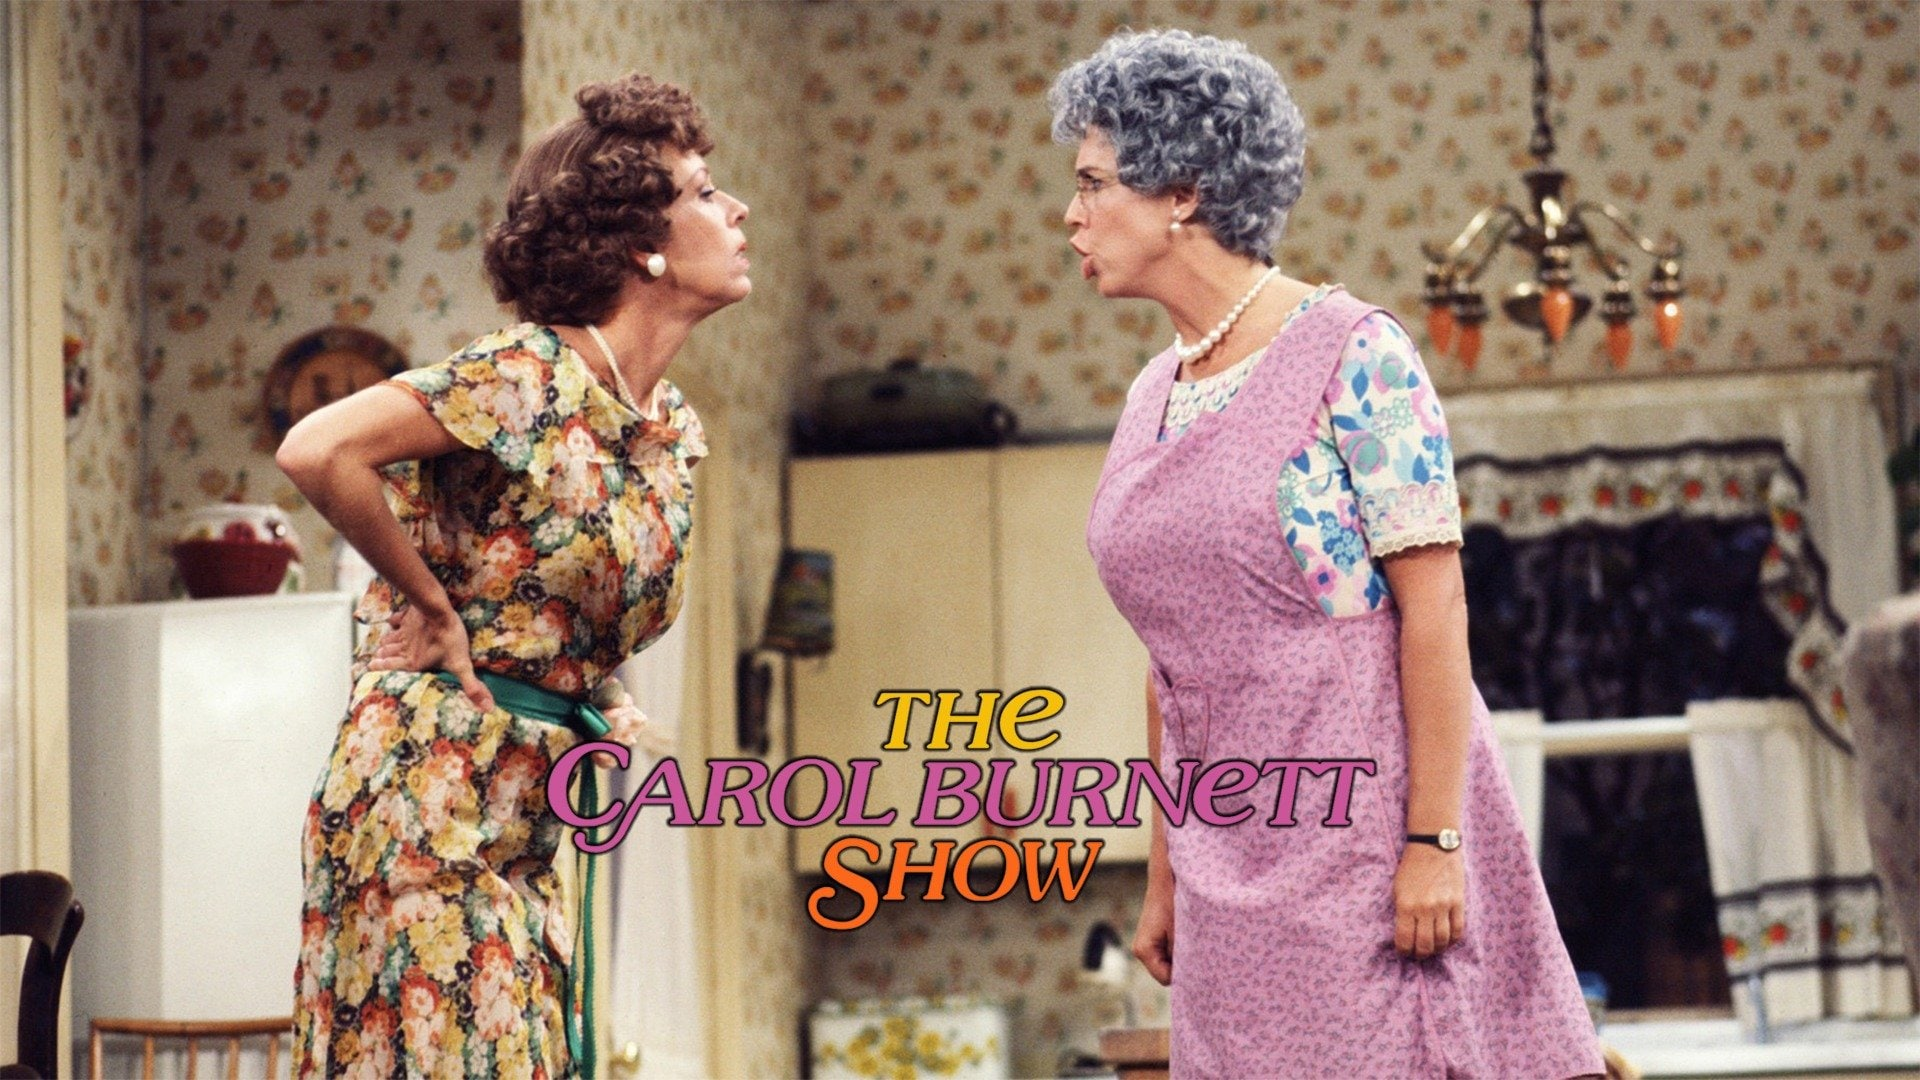 The Carol Burnett Show: Kaye Stevens and Audrey Meadows